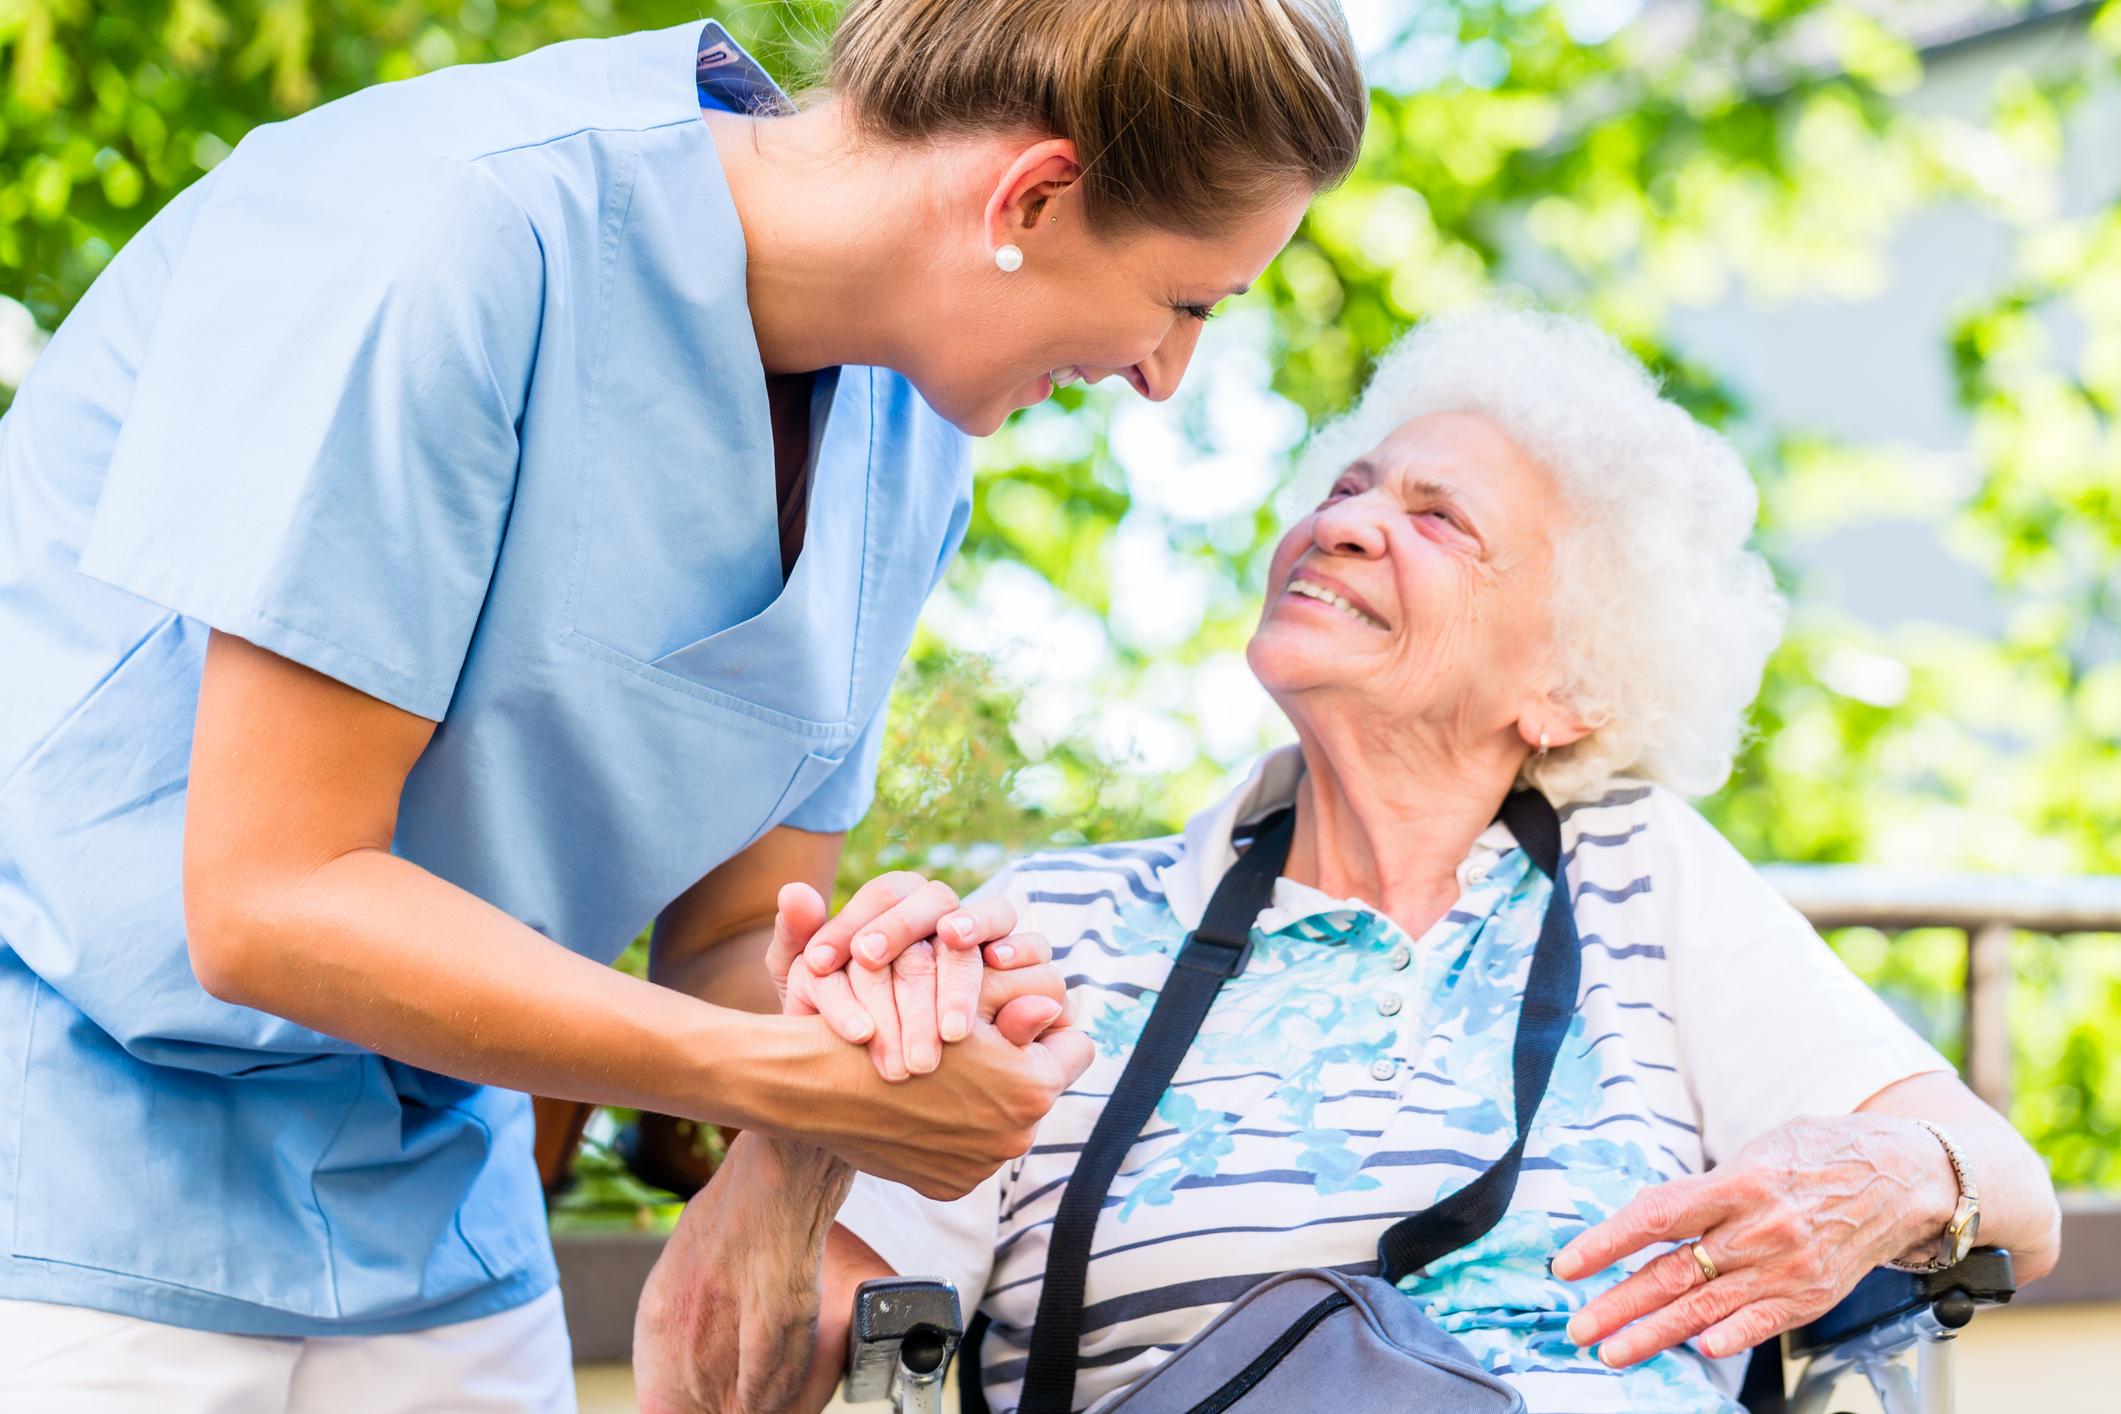 A health worrker holds an older woman's hand.